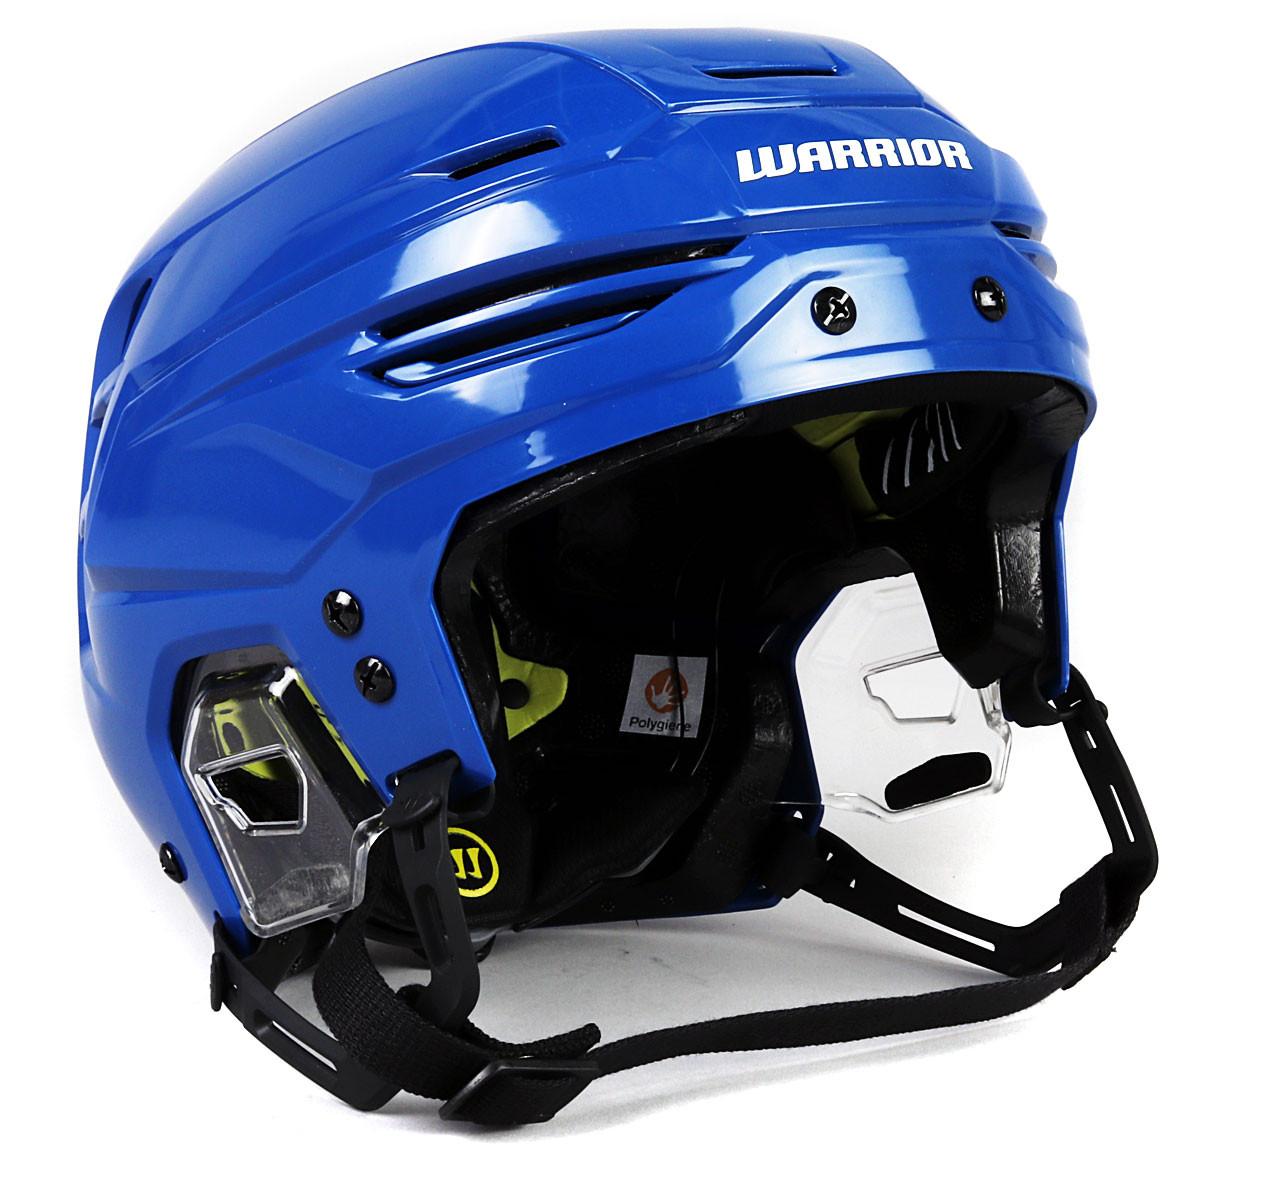 super popular cd39e dfe72 Size M - Warrior Alpha One Pro Royal Blue Helmet - Montreal ...